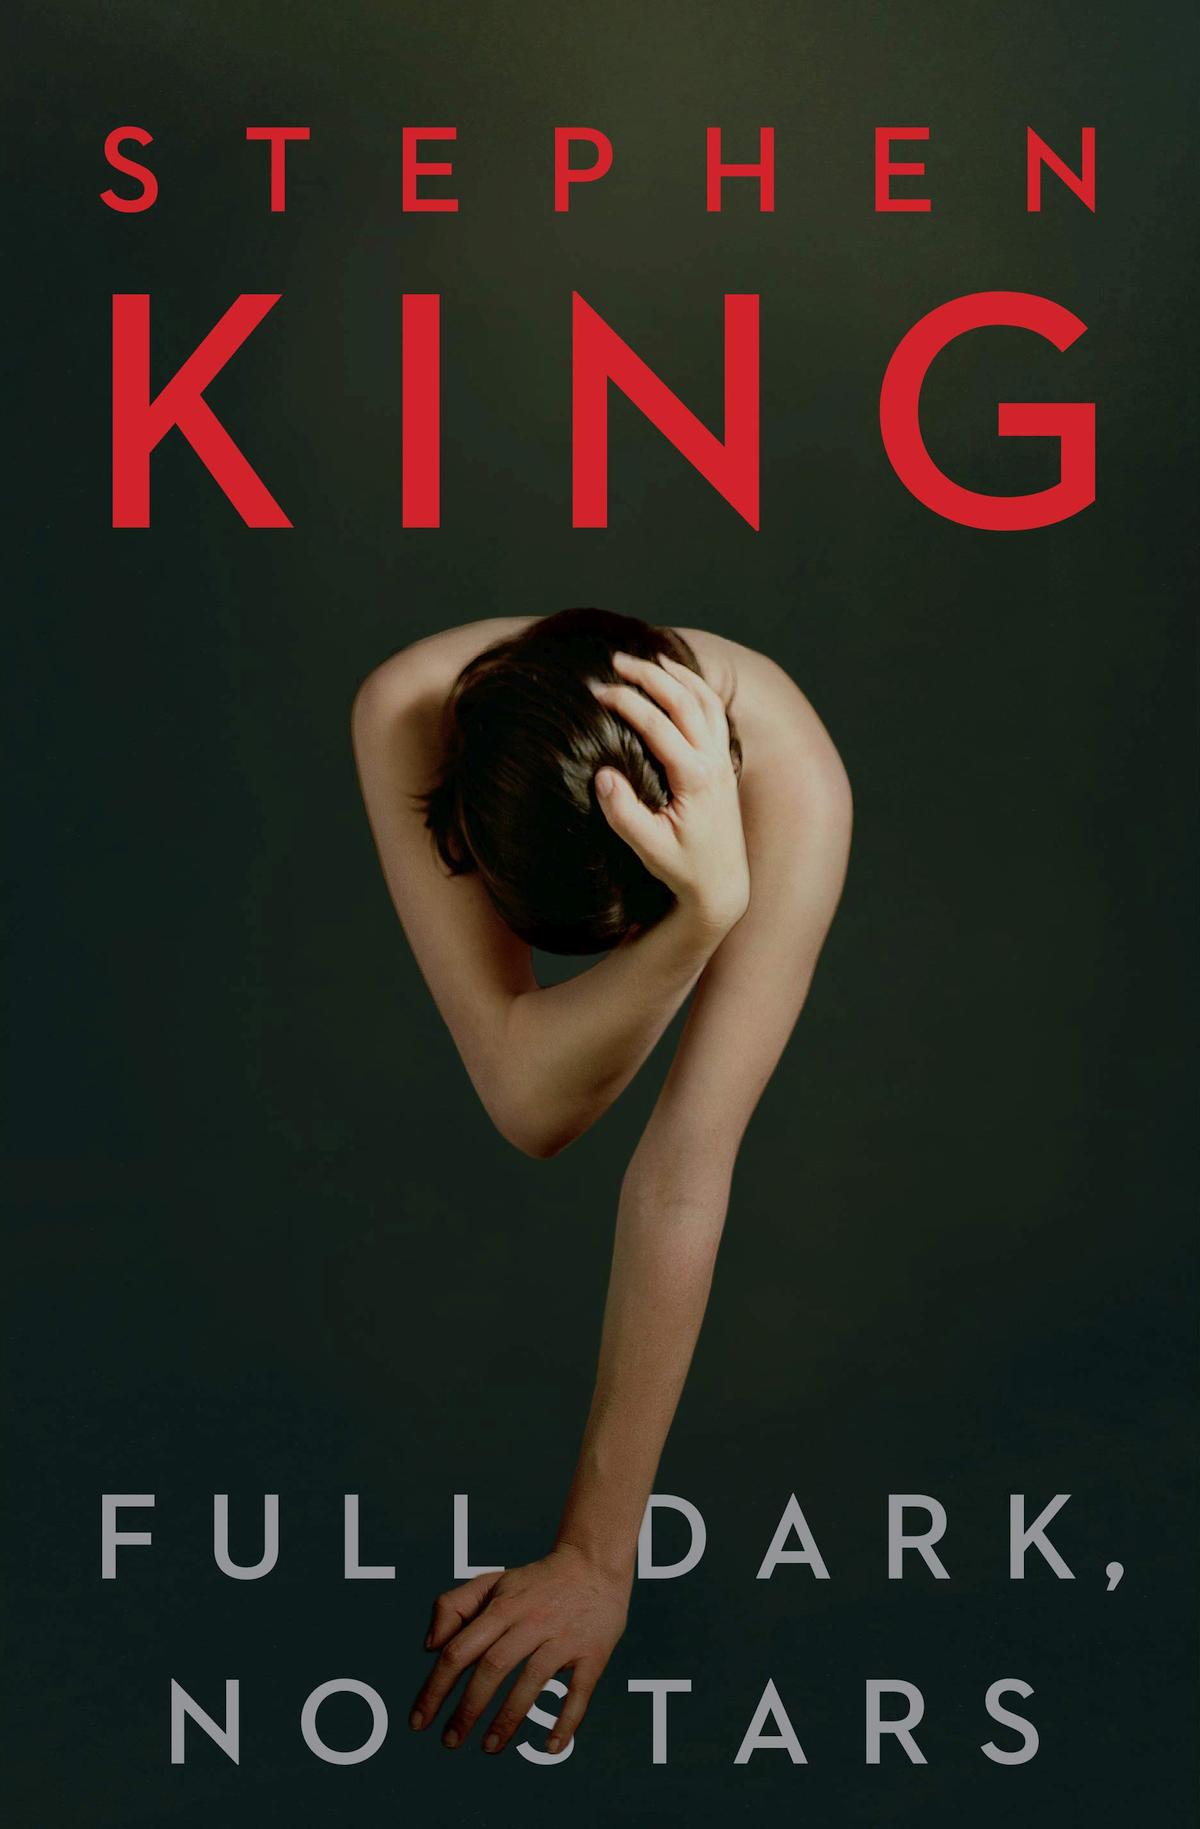 review : Full Dark No Stars ( book ) ... Stephen King